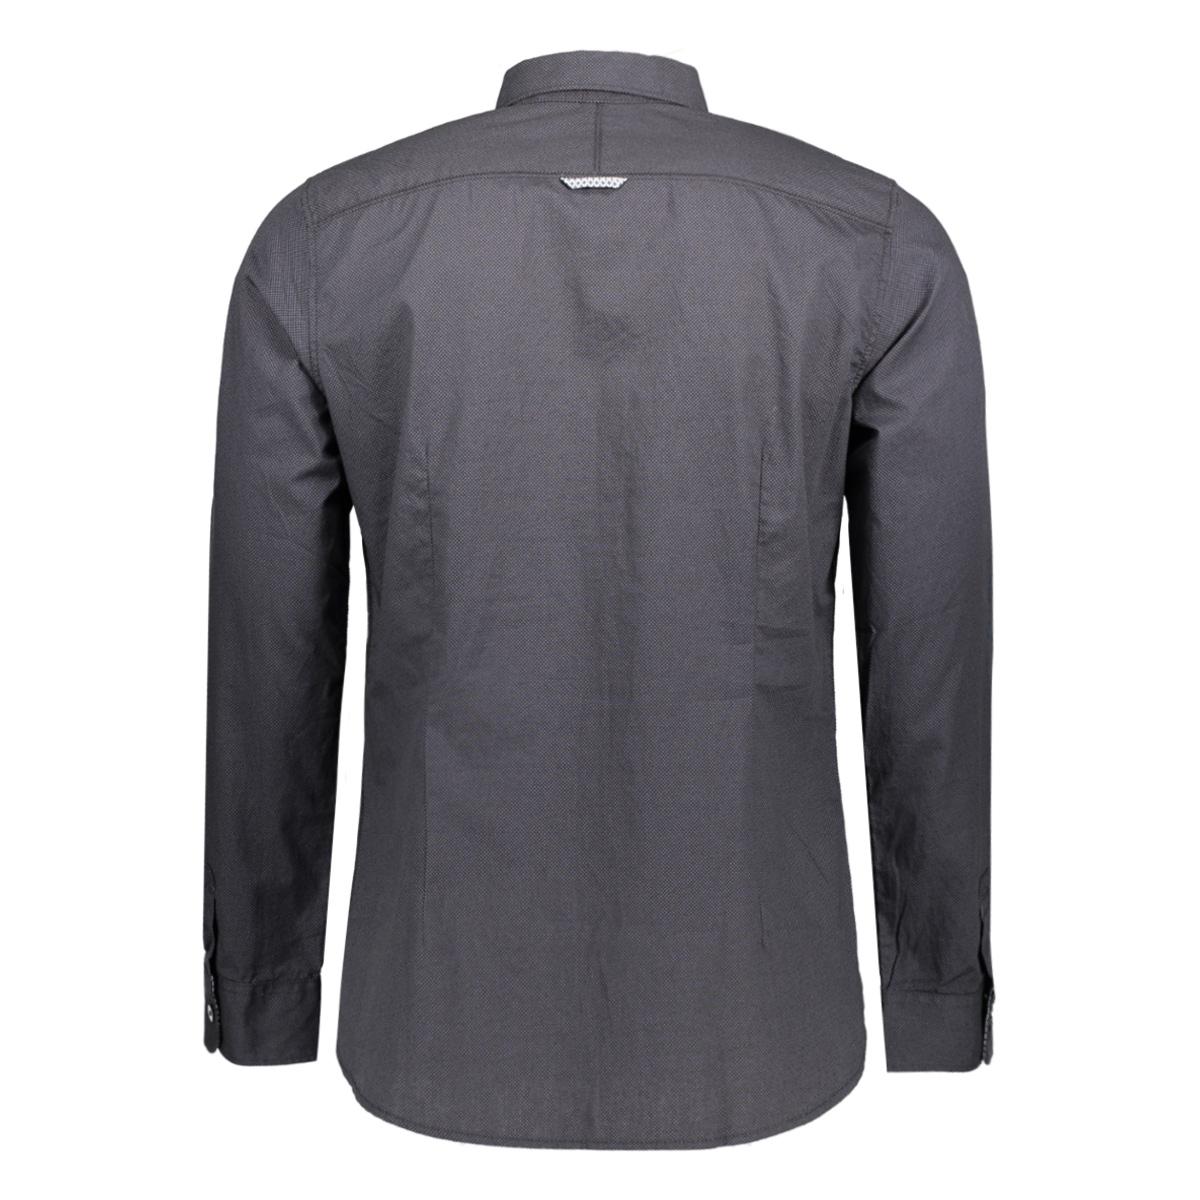 2033598.09.10 tom tailor overhemd 2999